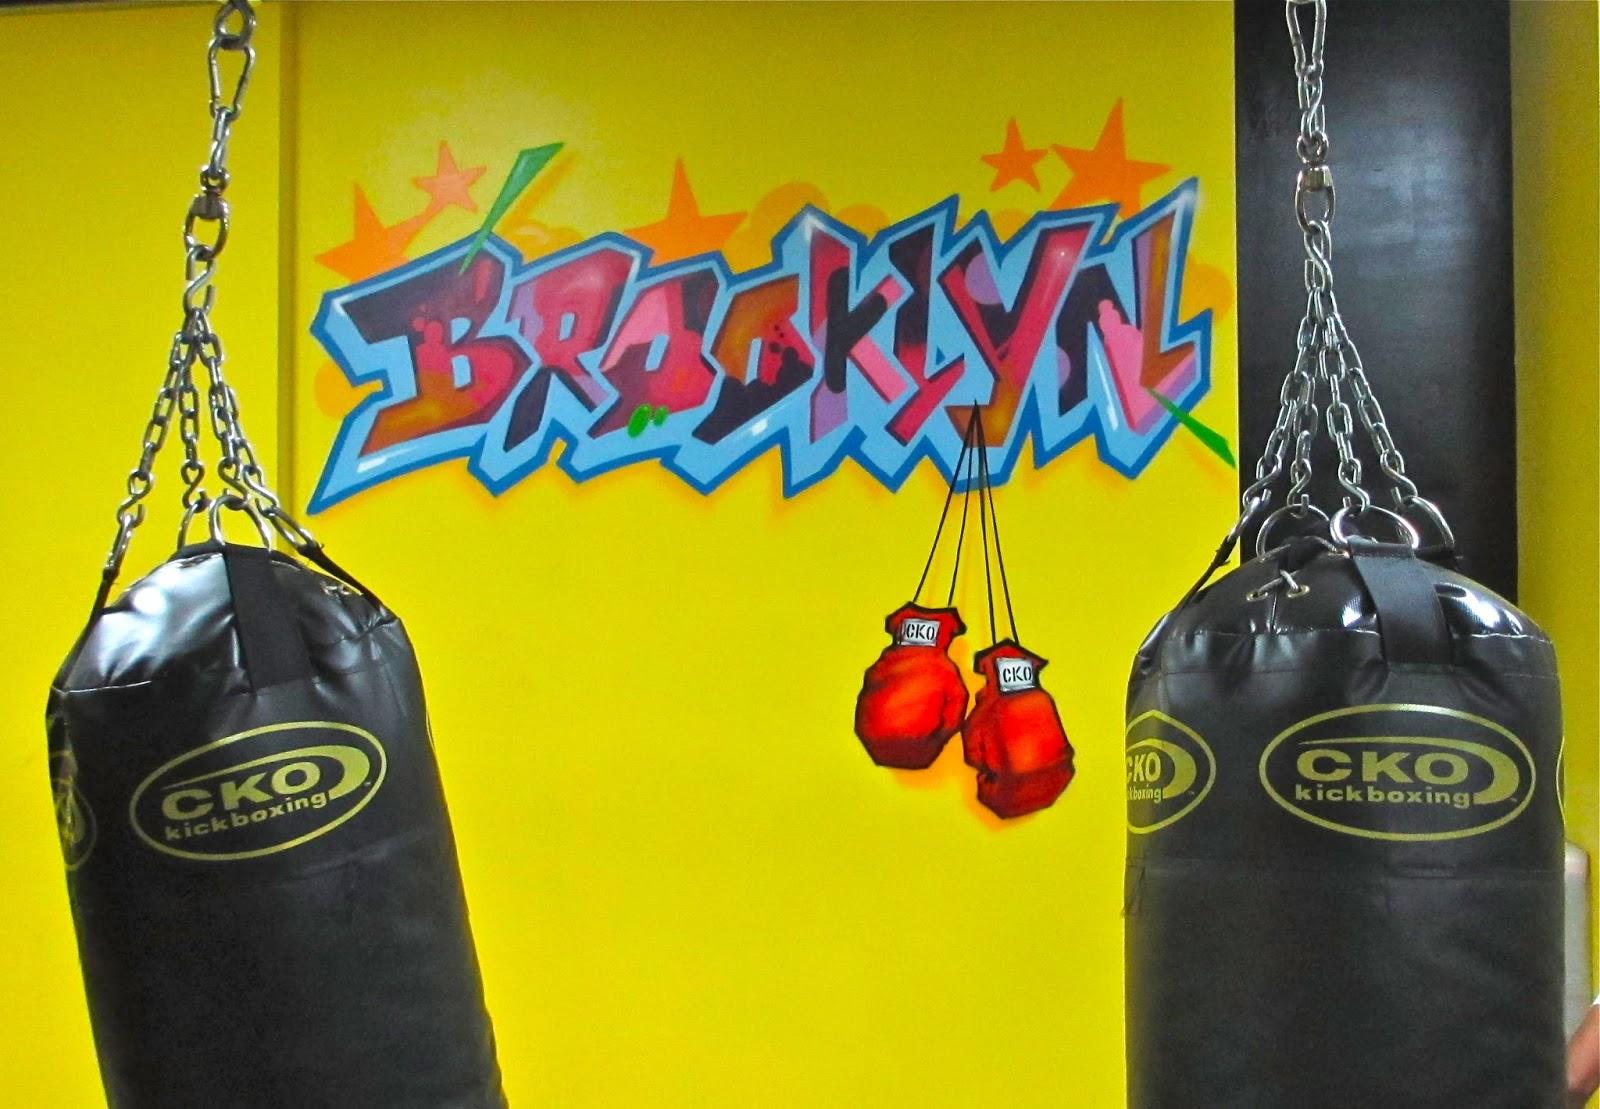 Tats Cru: CKO Kickboxing Gym